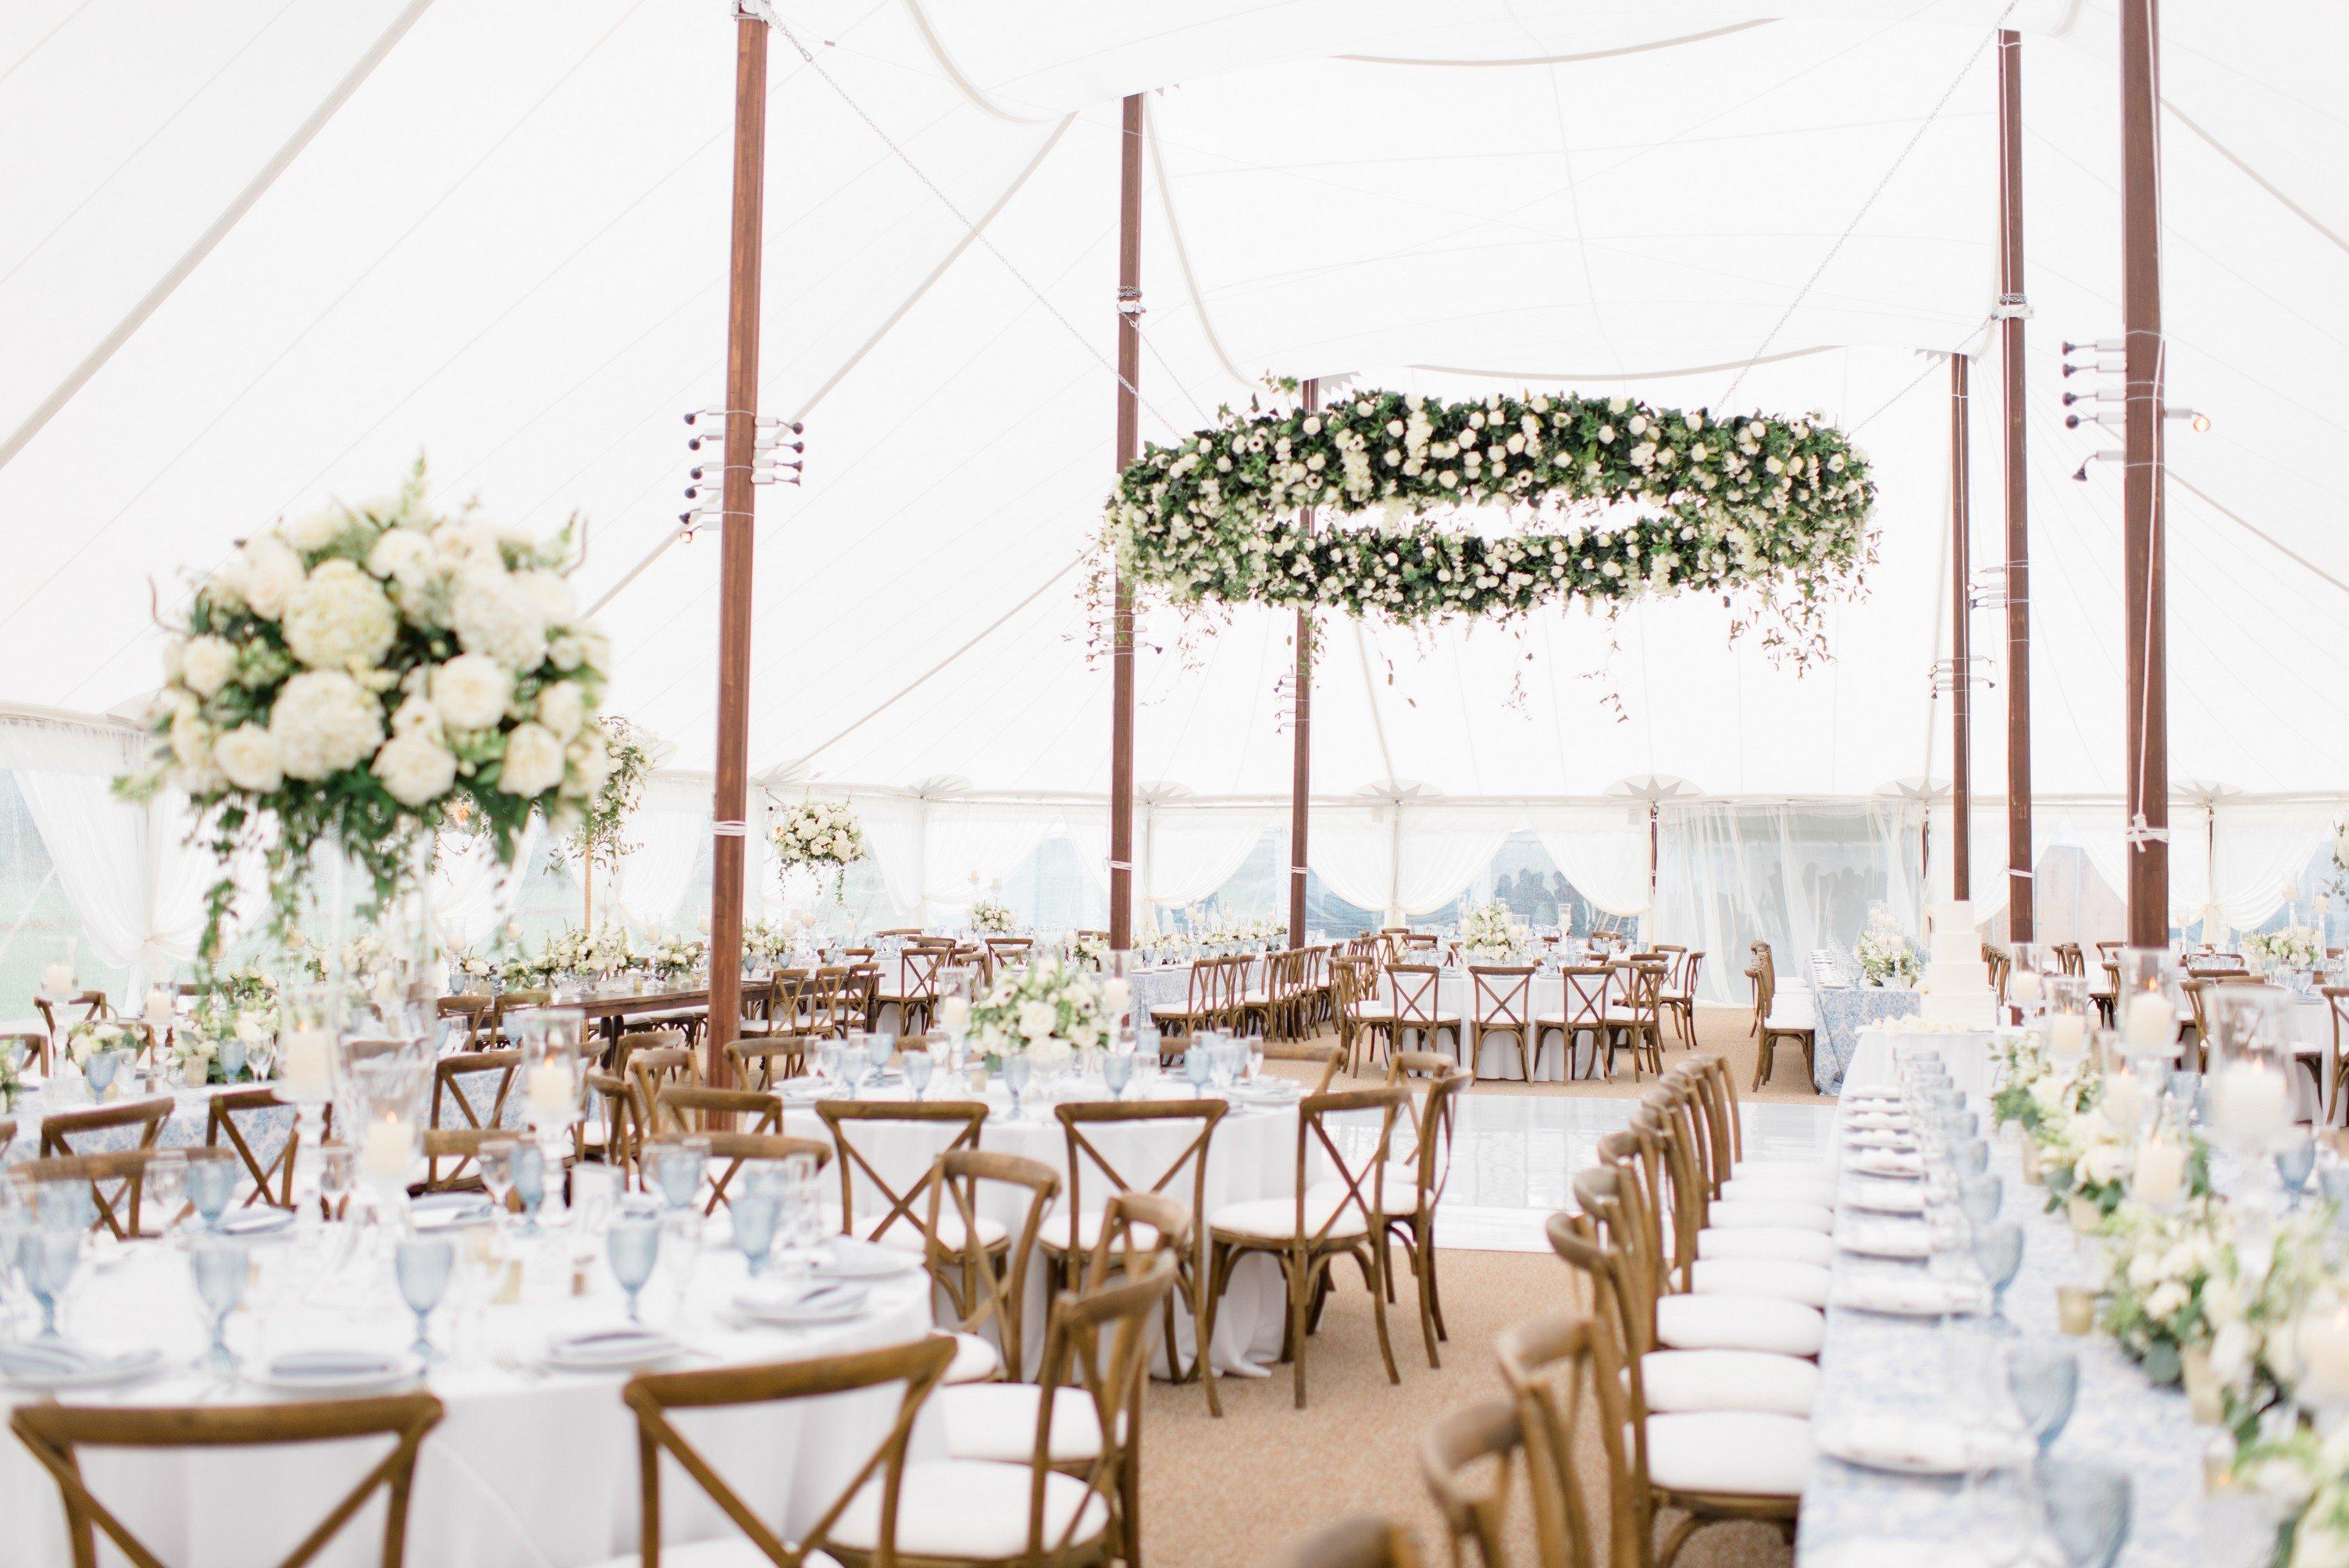 Arranmore Farm Polo Club Chicago Suburbs Luxury Wedding Venue